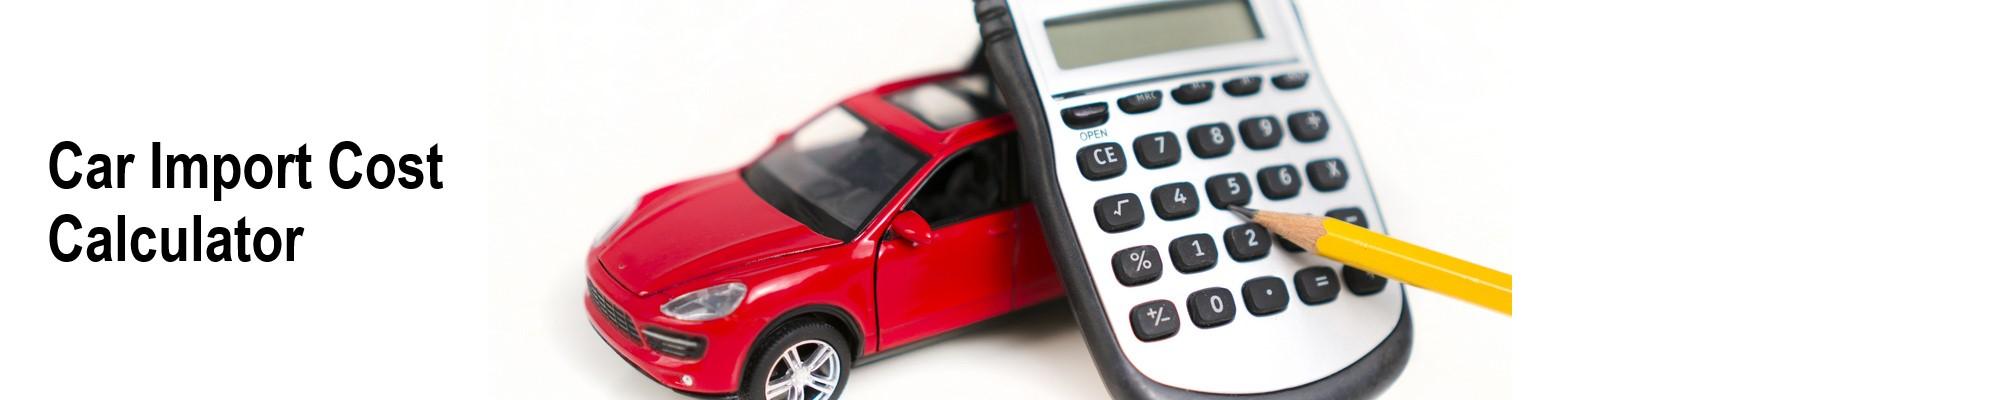 car import cost calculator